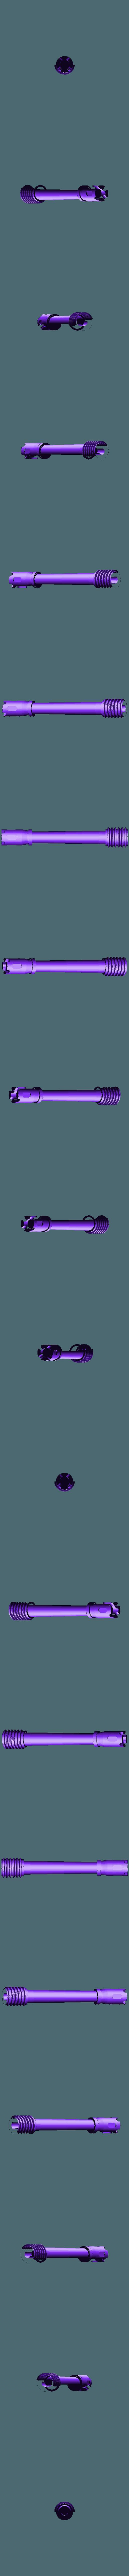 Autocannon_barrel.stl Download free STL file Robot Dread • 3D print template, Mazer